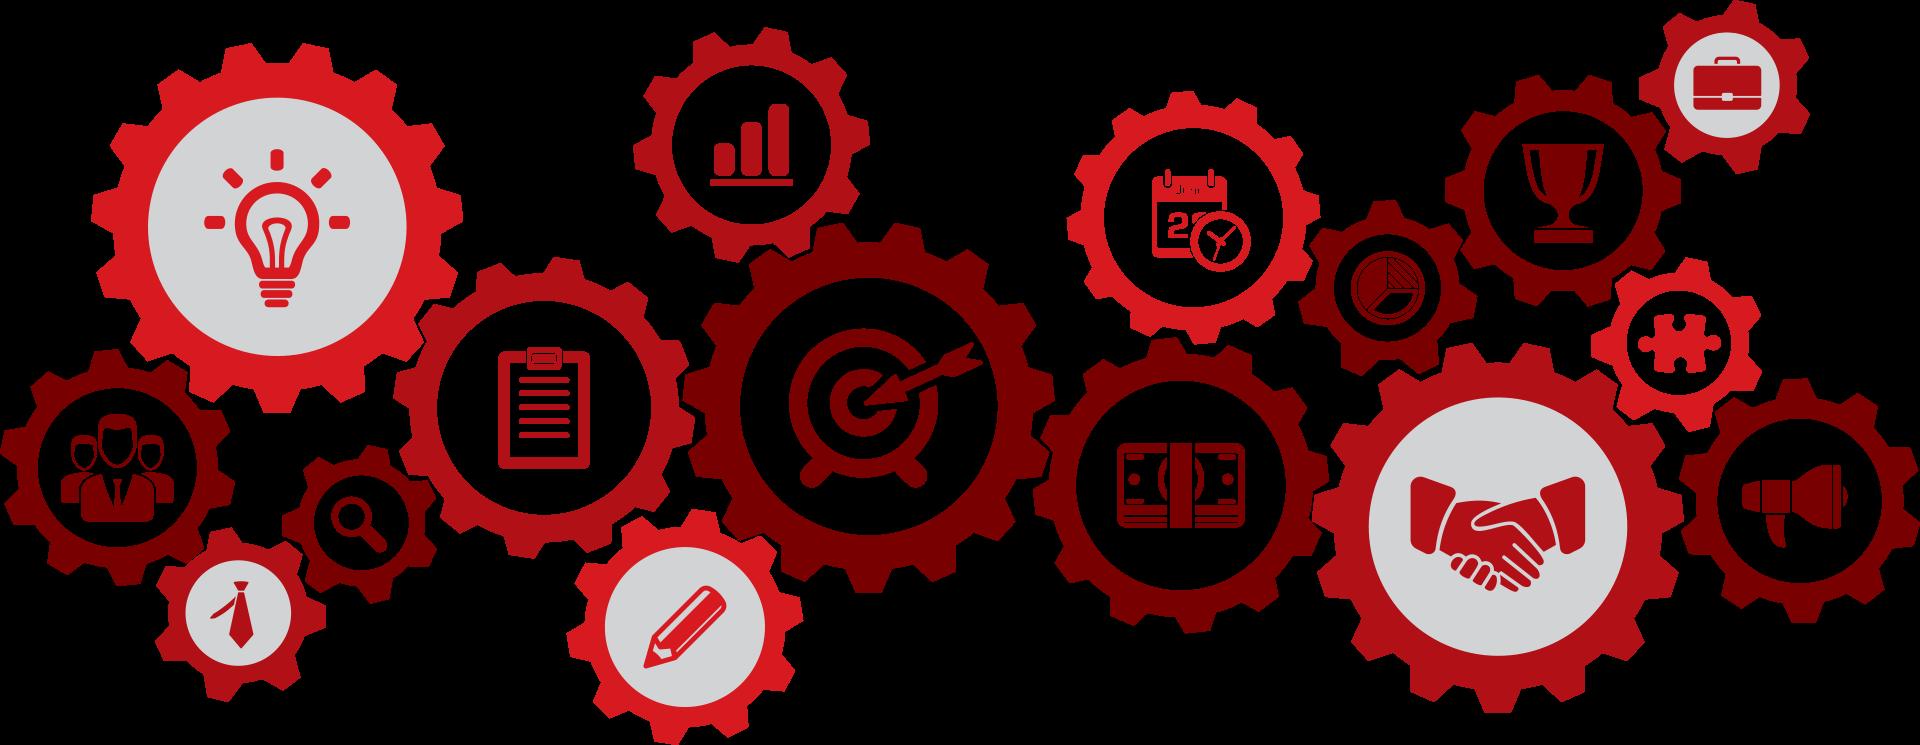 labor symbols such as gears, light bulbs, etc.